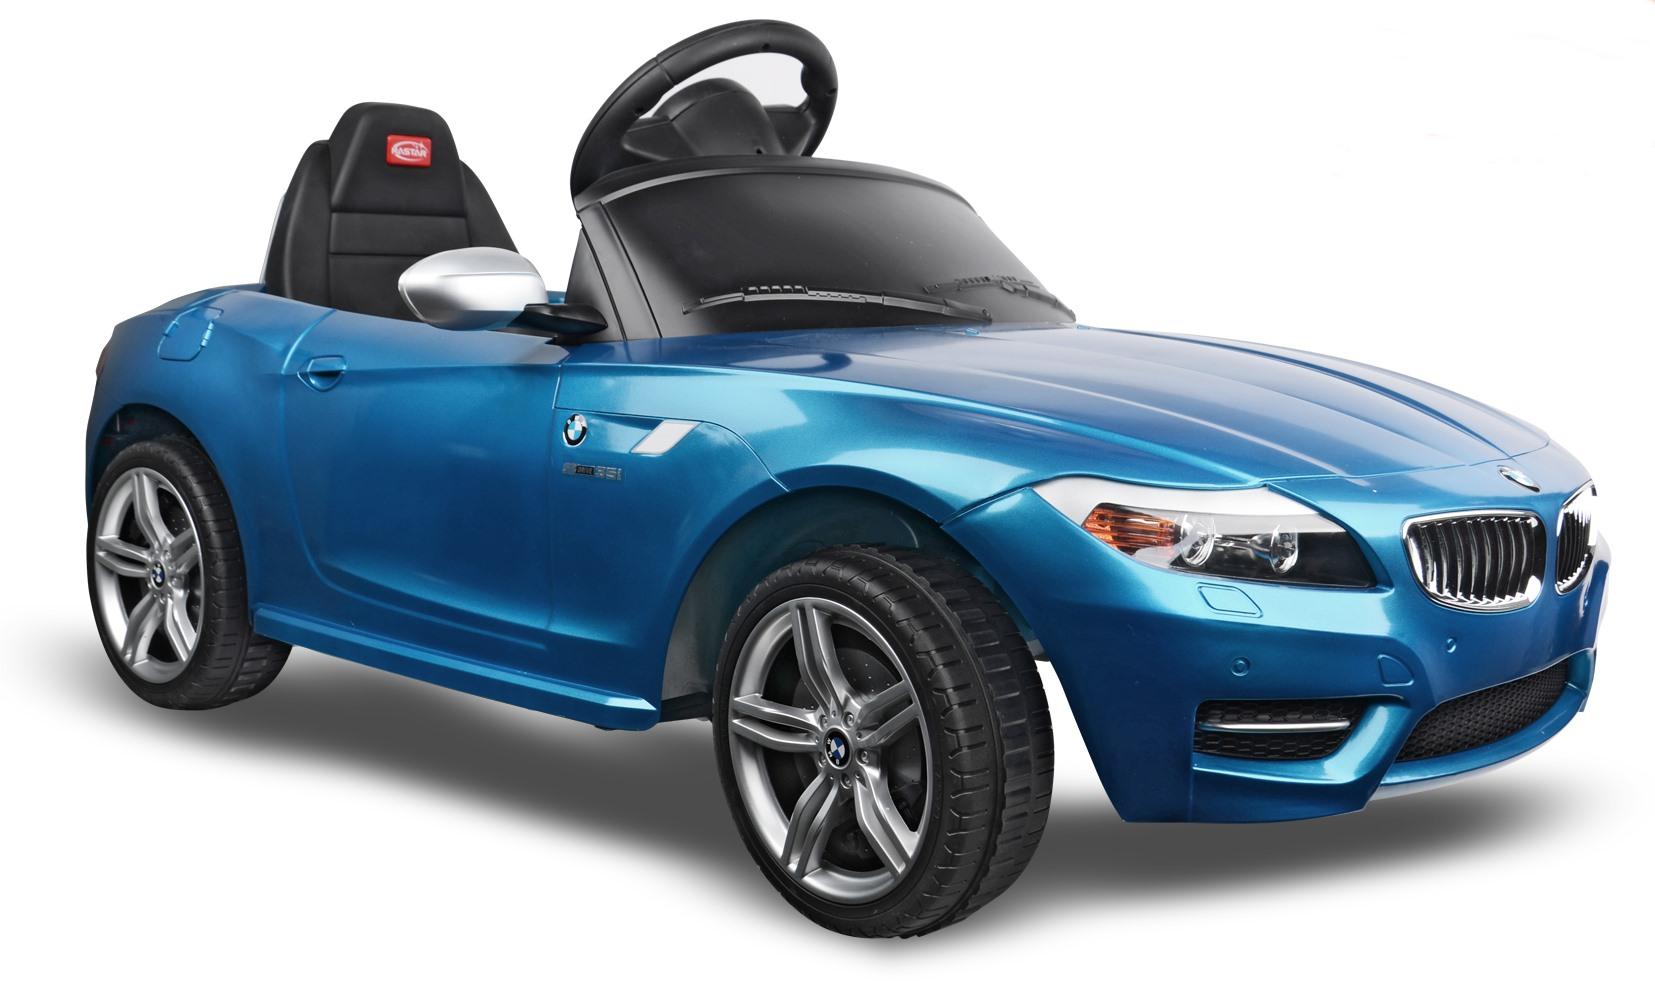 6v bmw z4 blau kinder elektro auto kinderauto online shop. Black Bedroom Furniture Sets. Home Design Ideas